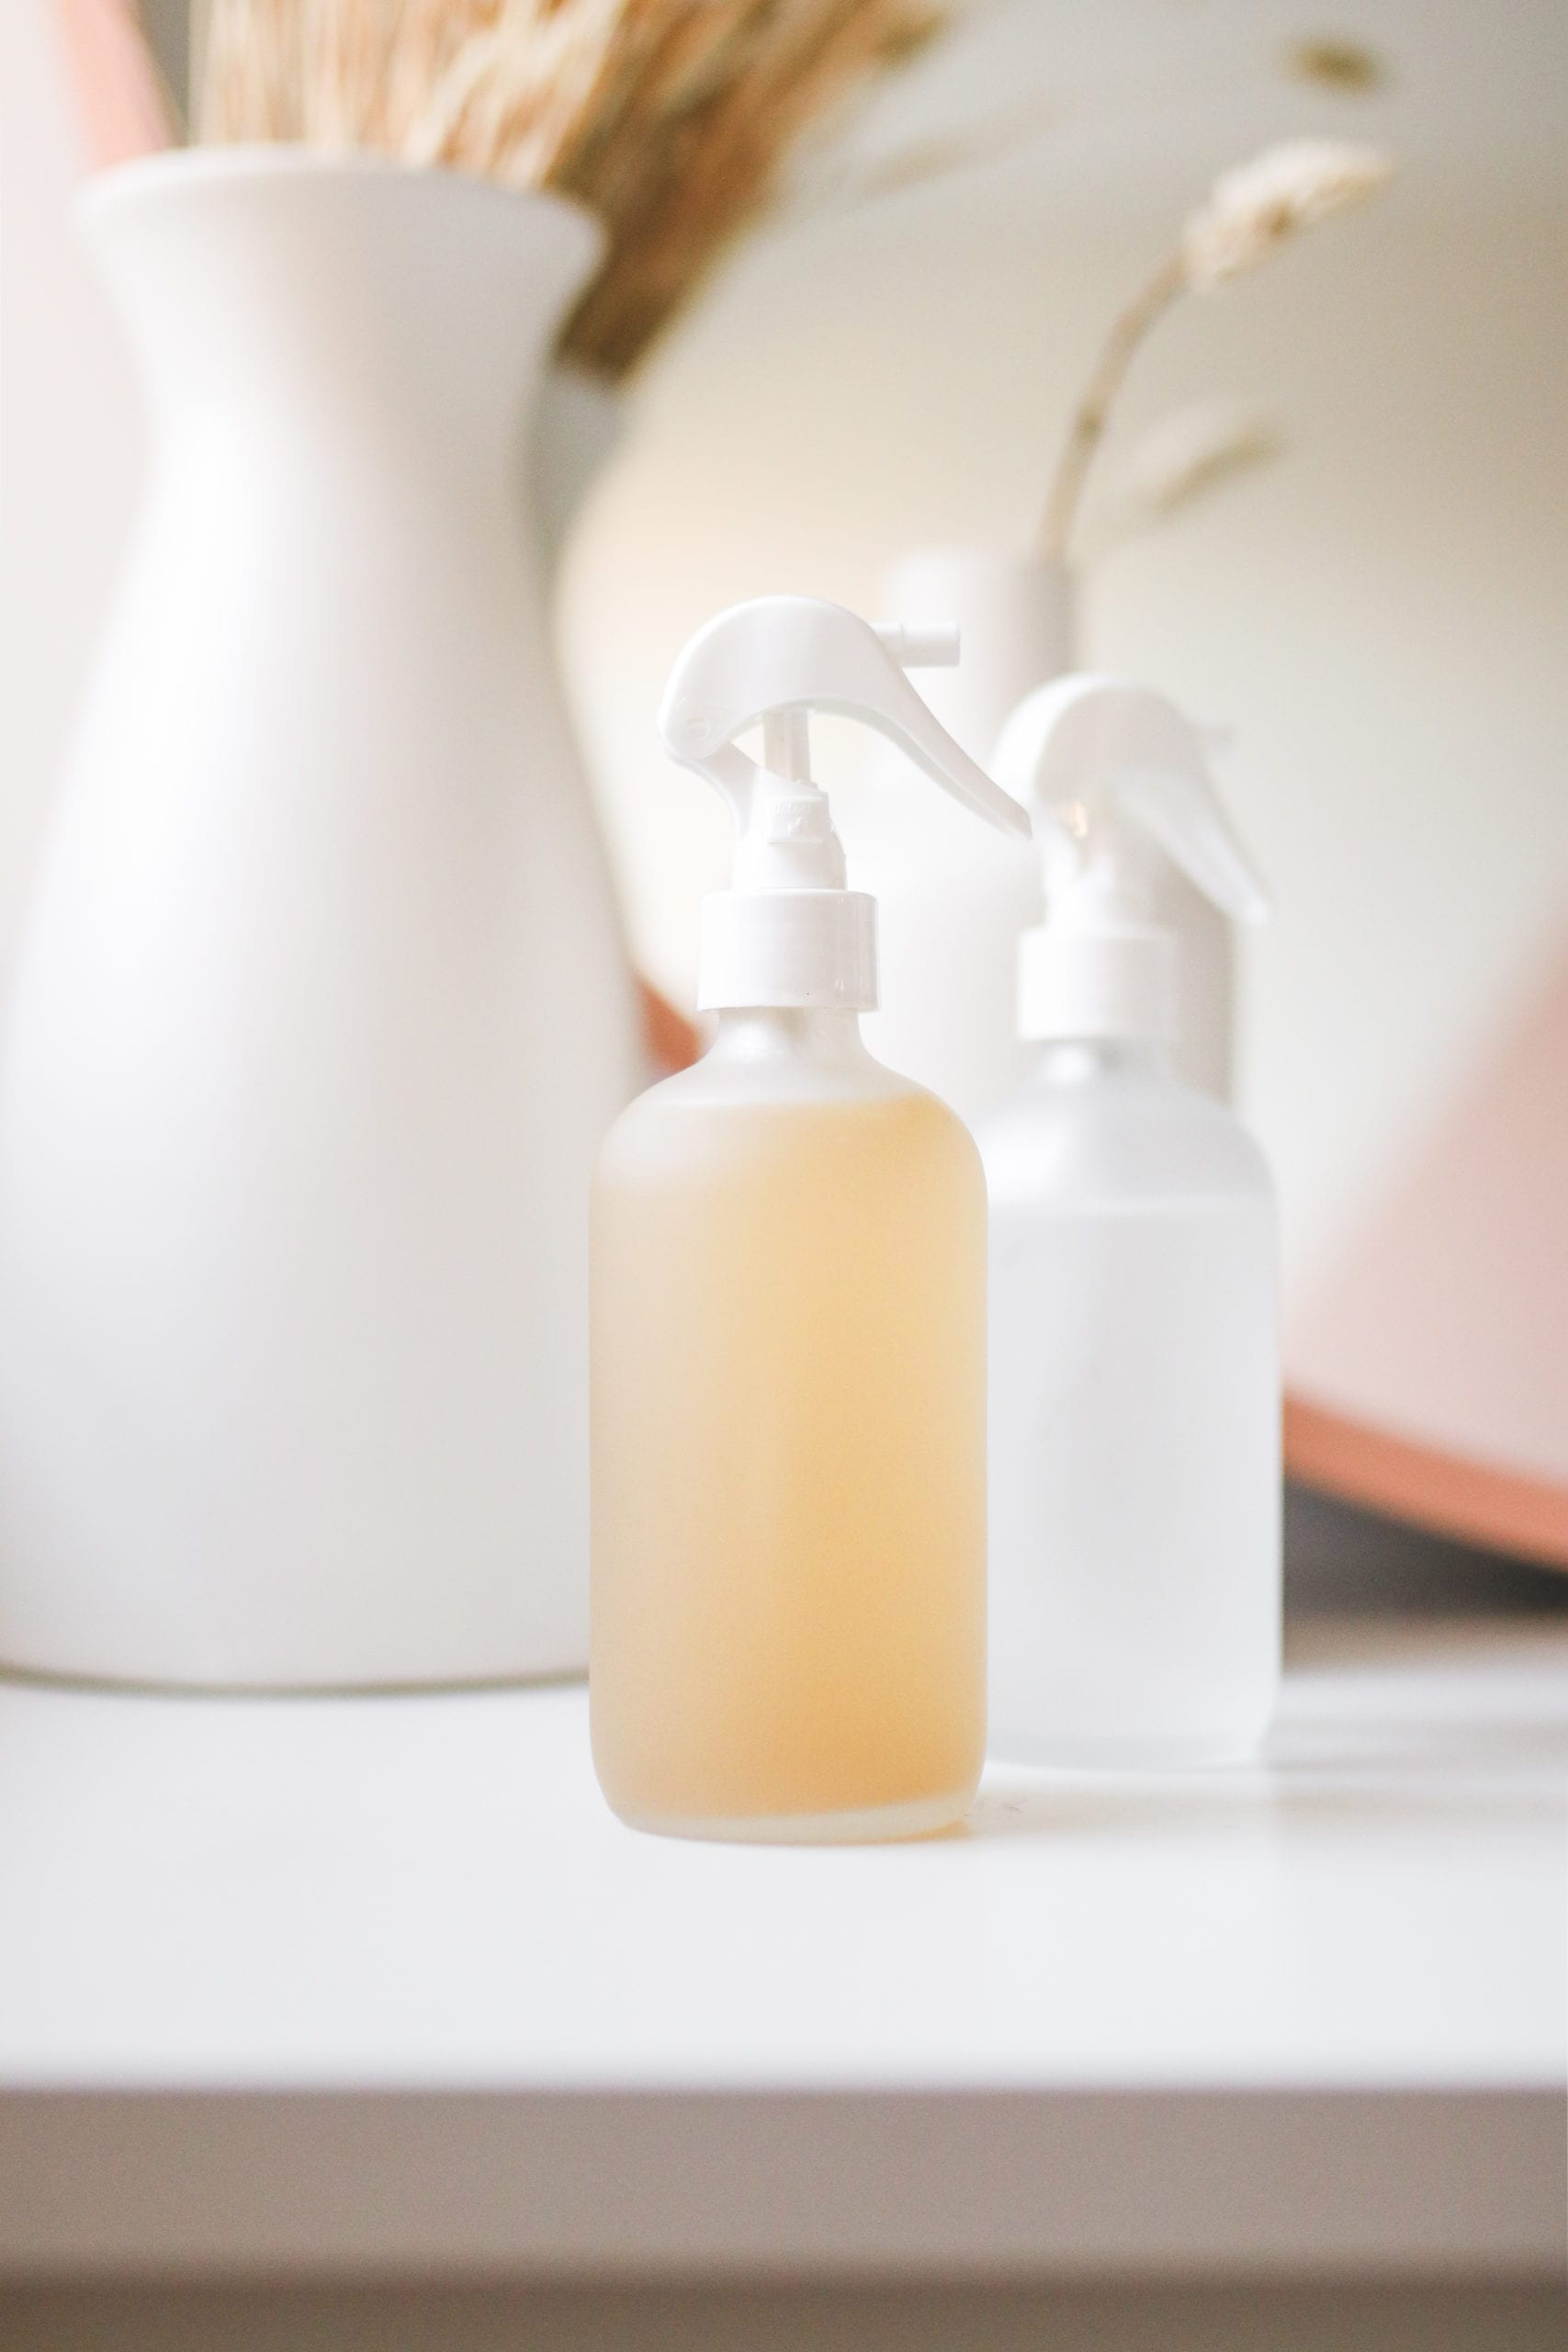 Homemade Non-Toxic Cleaning Spray Veggiekins